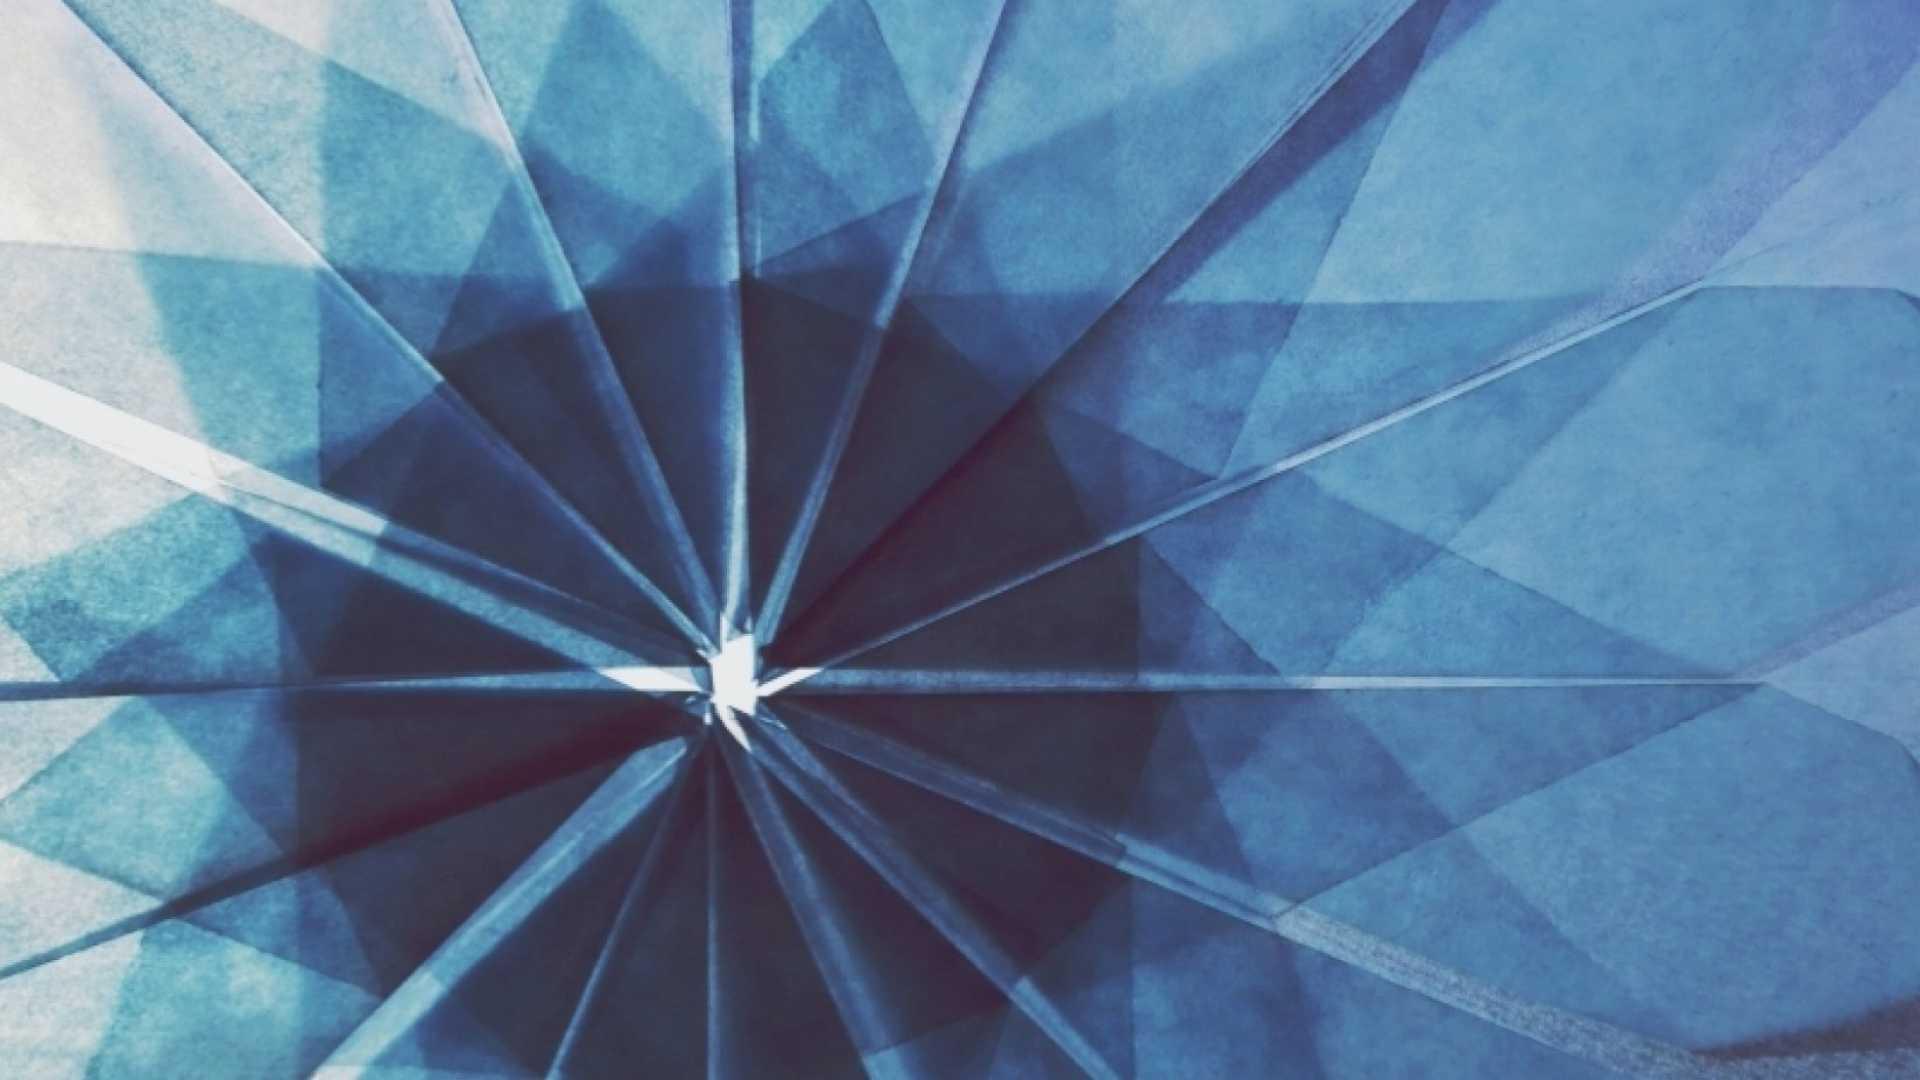 3 Ways to Apply Design Thinking in 2016